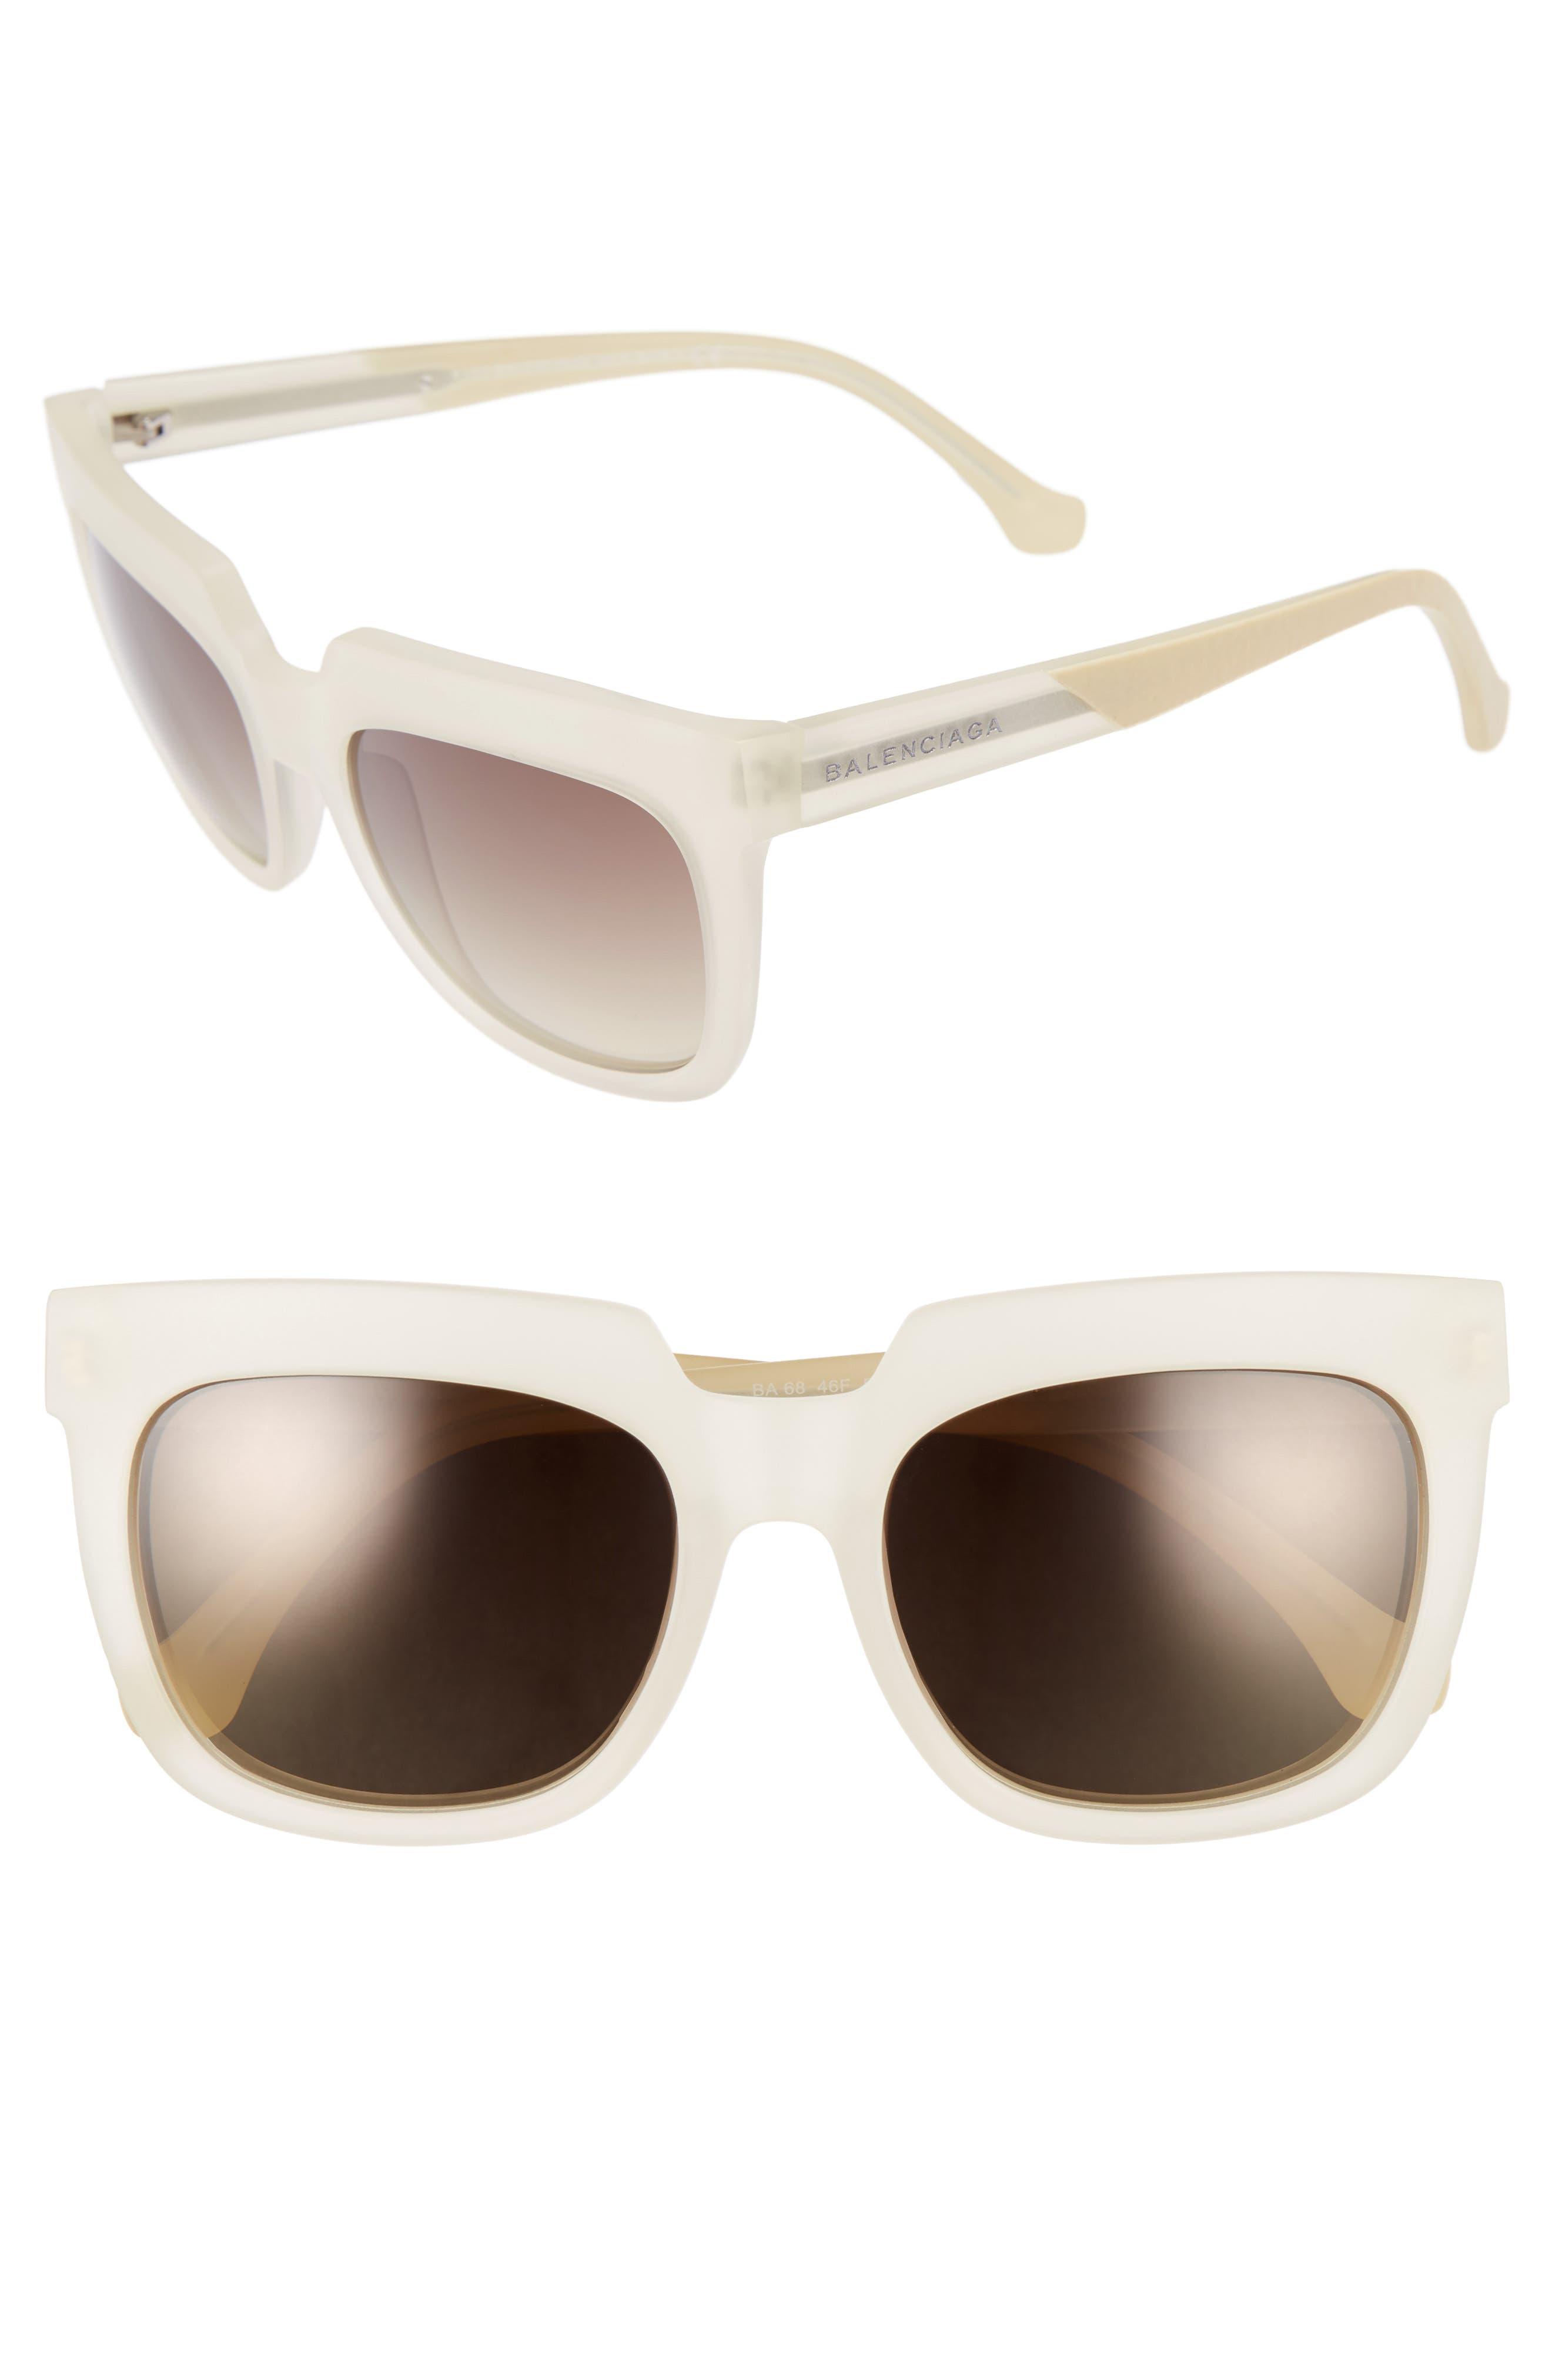 55mm Sunglasses,                             Alternate thumbnail 8, color,